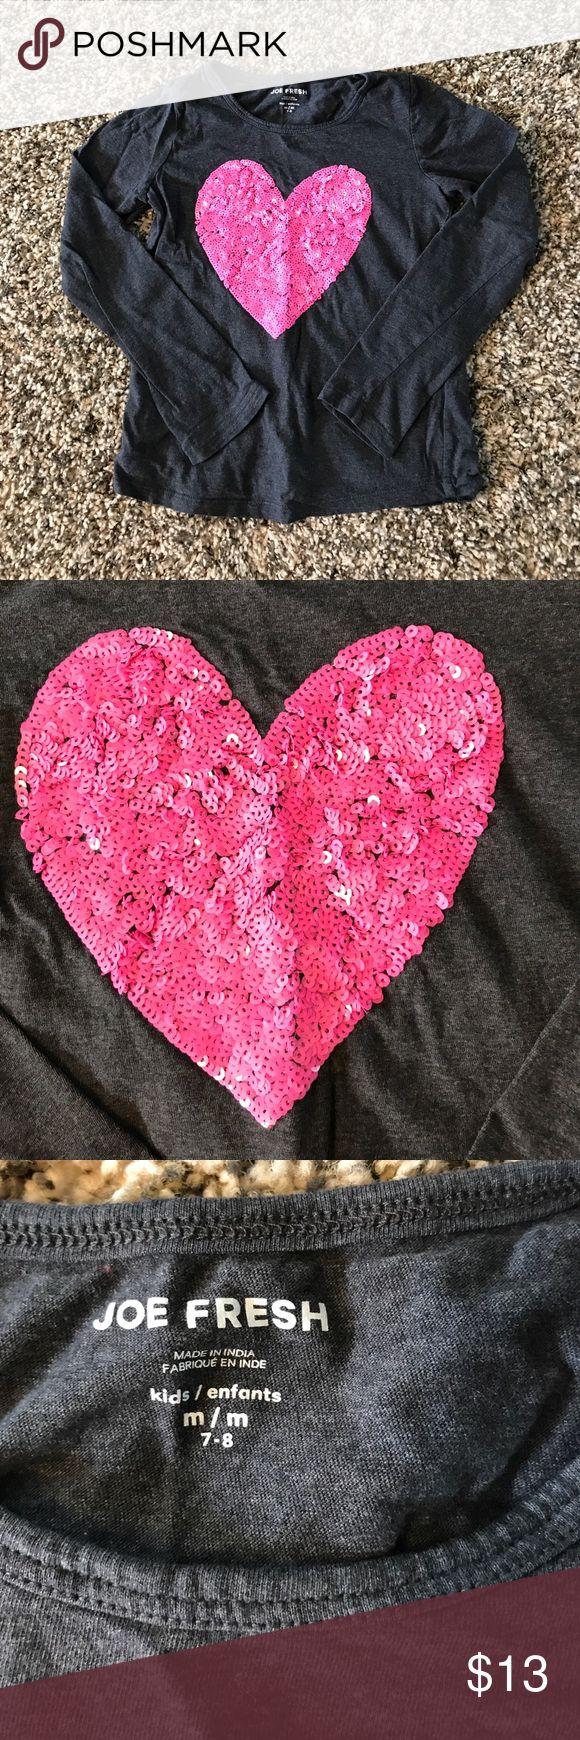 Joe Fresh Sequin Shirt EUC Joe Fresh Sequined Heart Shirt. Girls 7-8 Joe Fresh Shirts & Tops Tees - Long Sleeve